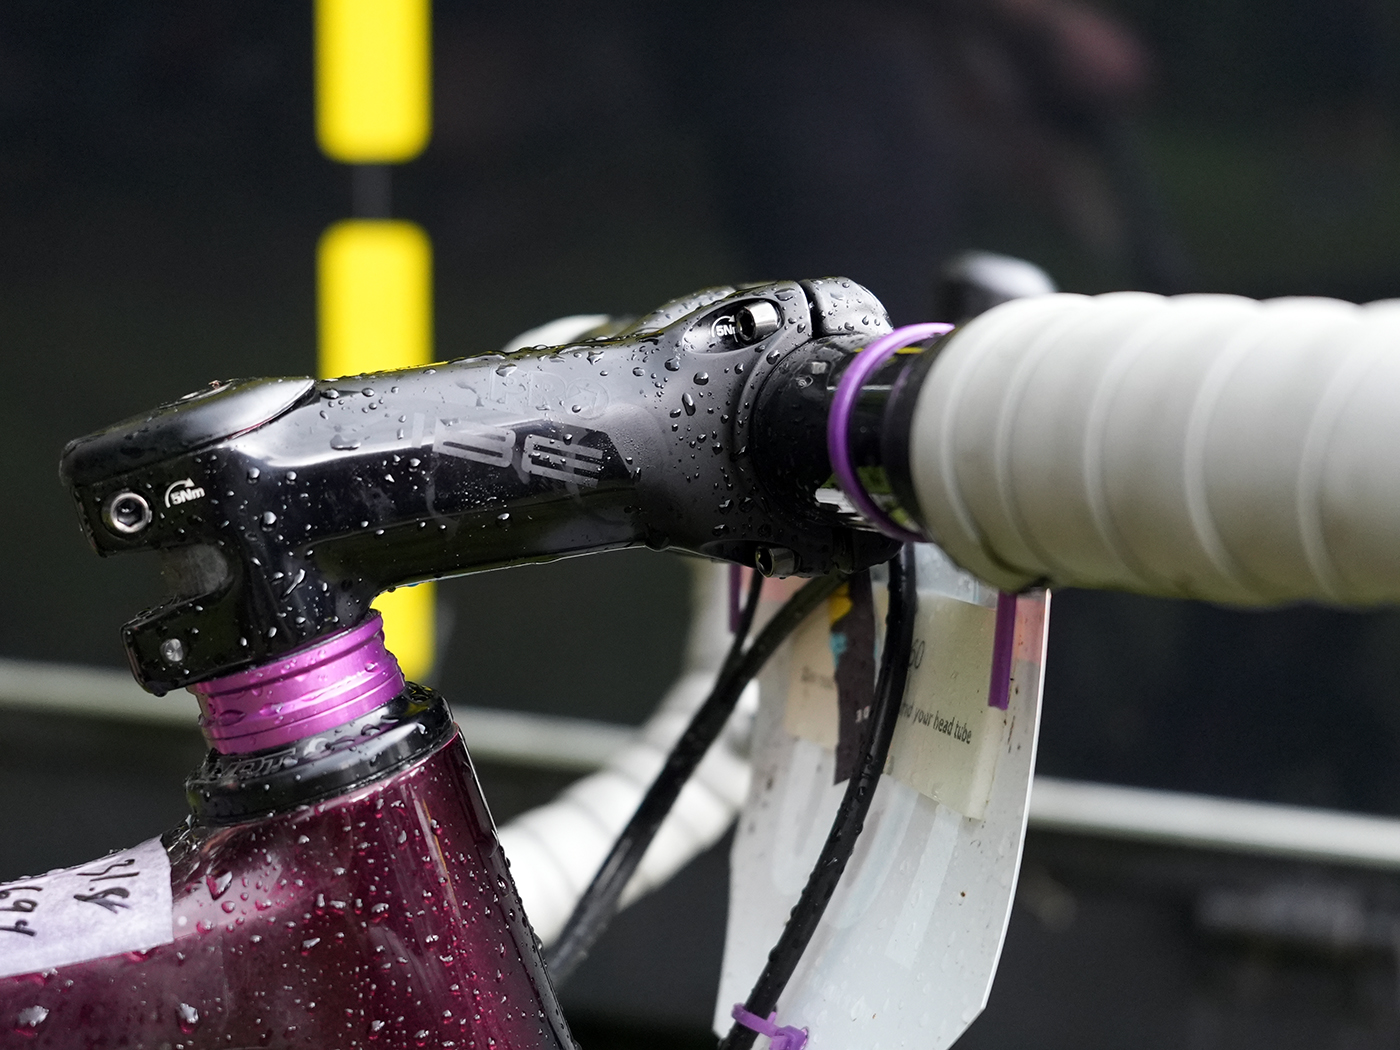 cockpit spec details on gordon wadsworth's pivot vault gravel race bike